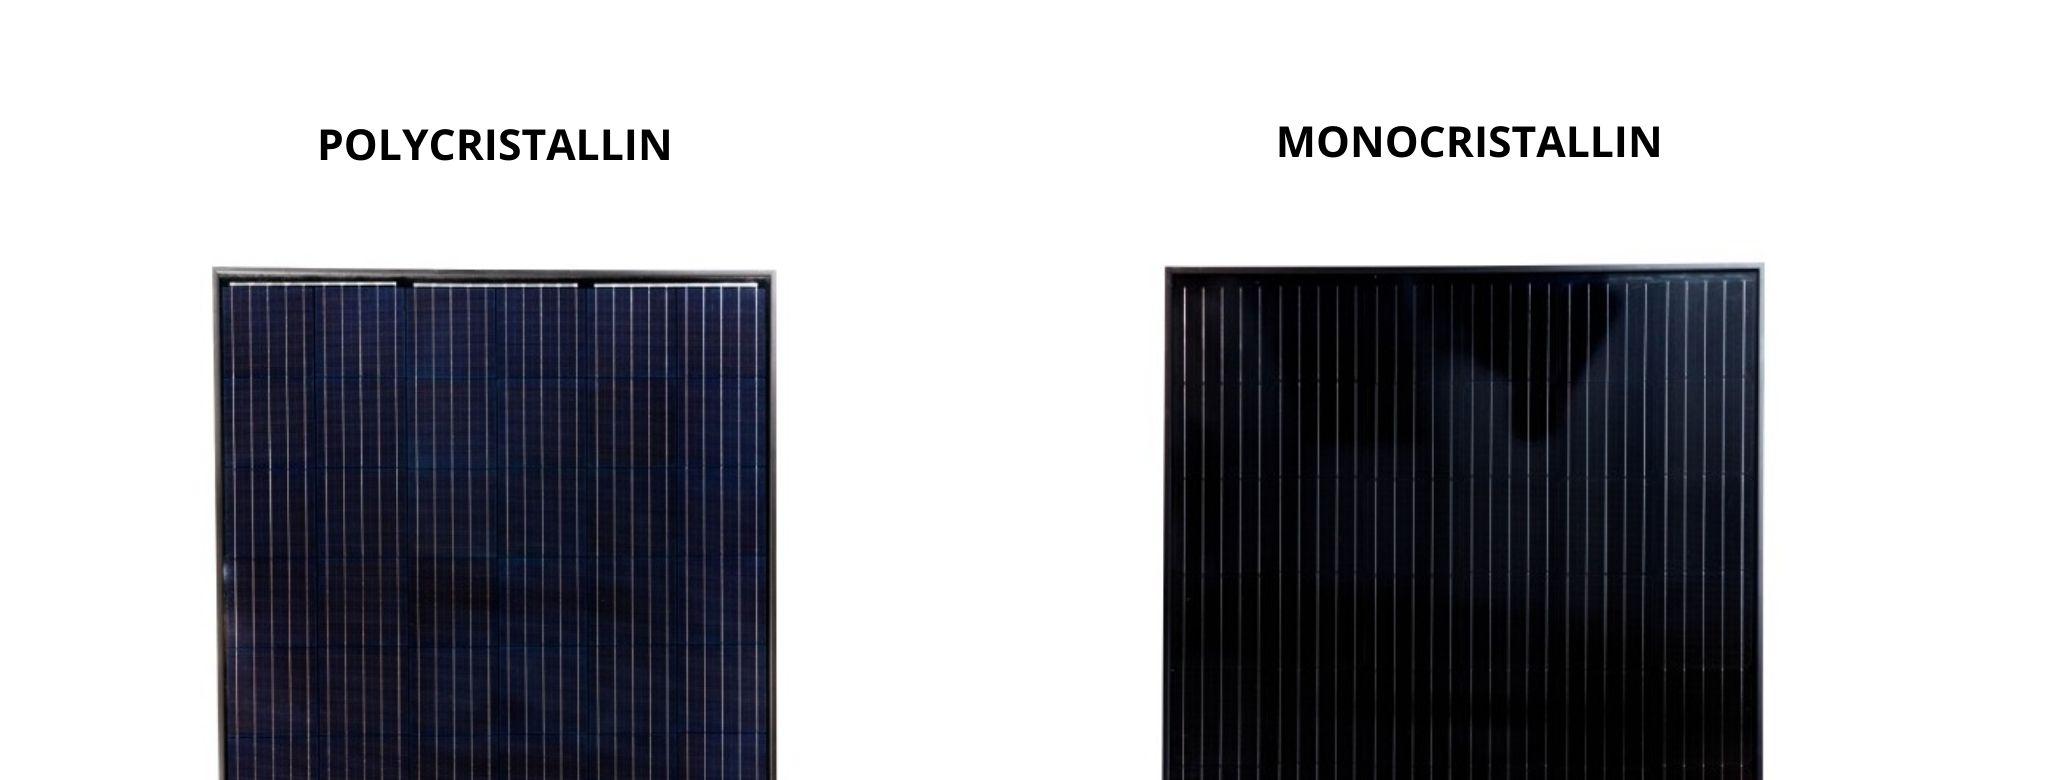 meilleur-panneau-solaire-monocristallin-polycristallin